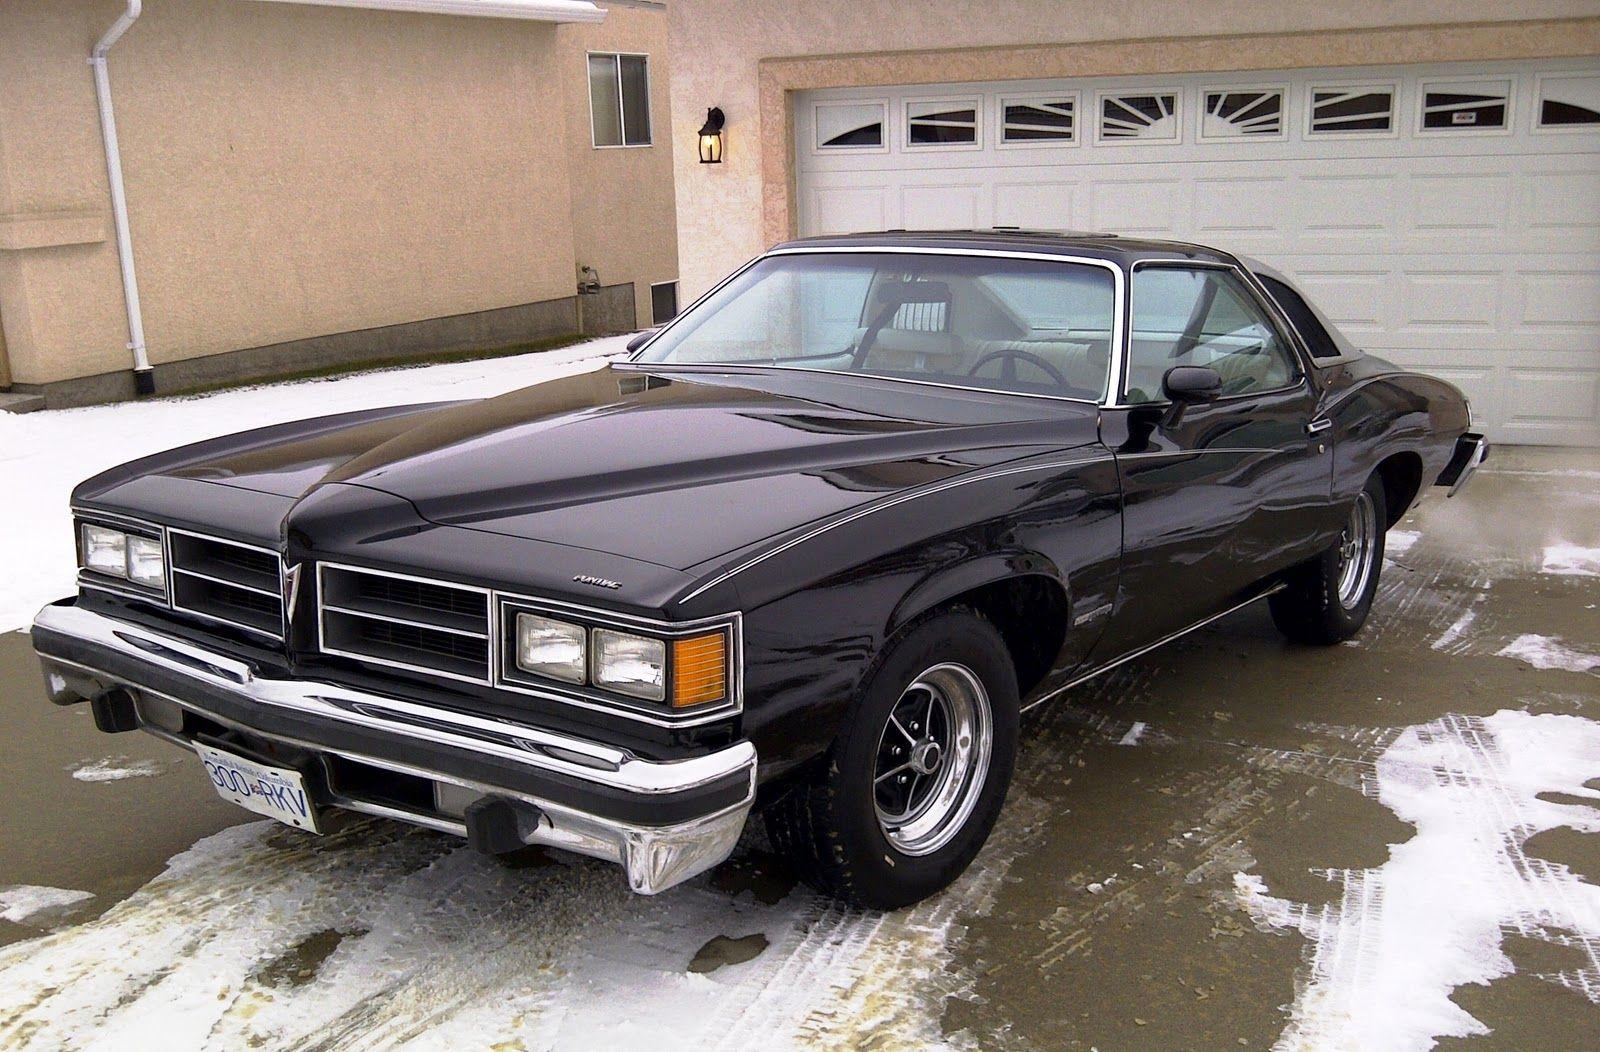 76 pontiac lemans   1976 History and Identification   Cars I\'ve ...